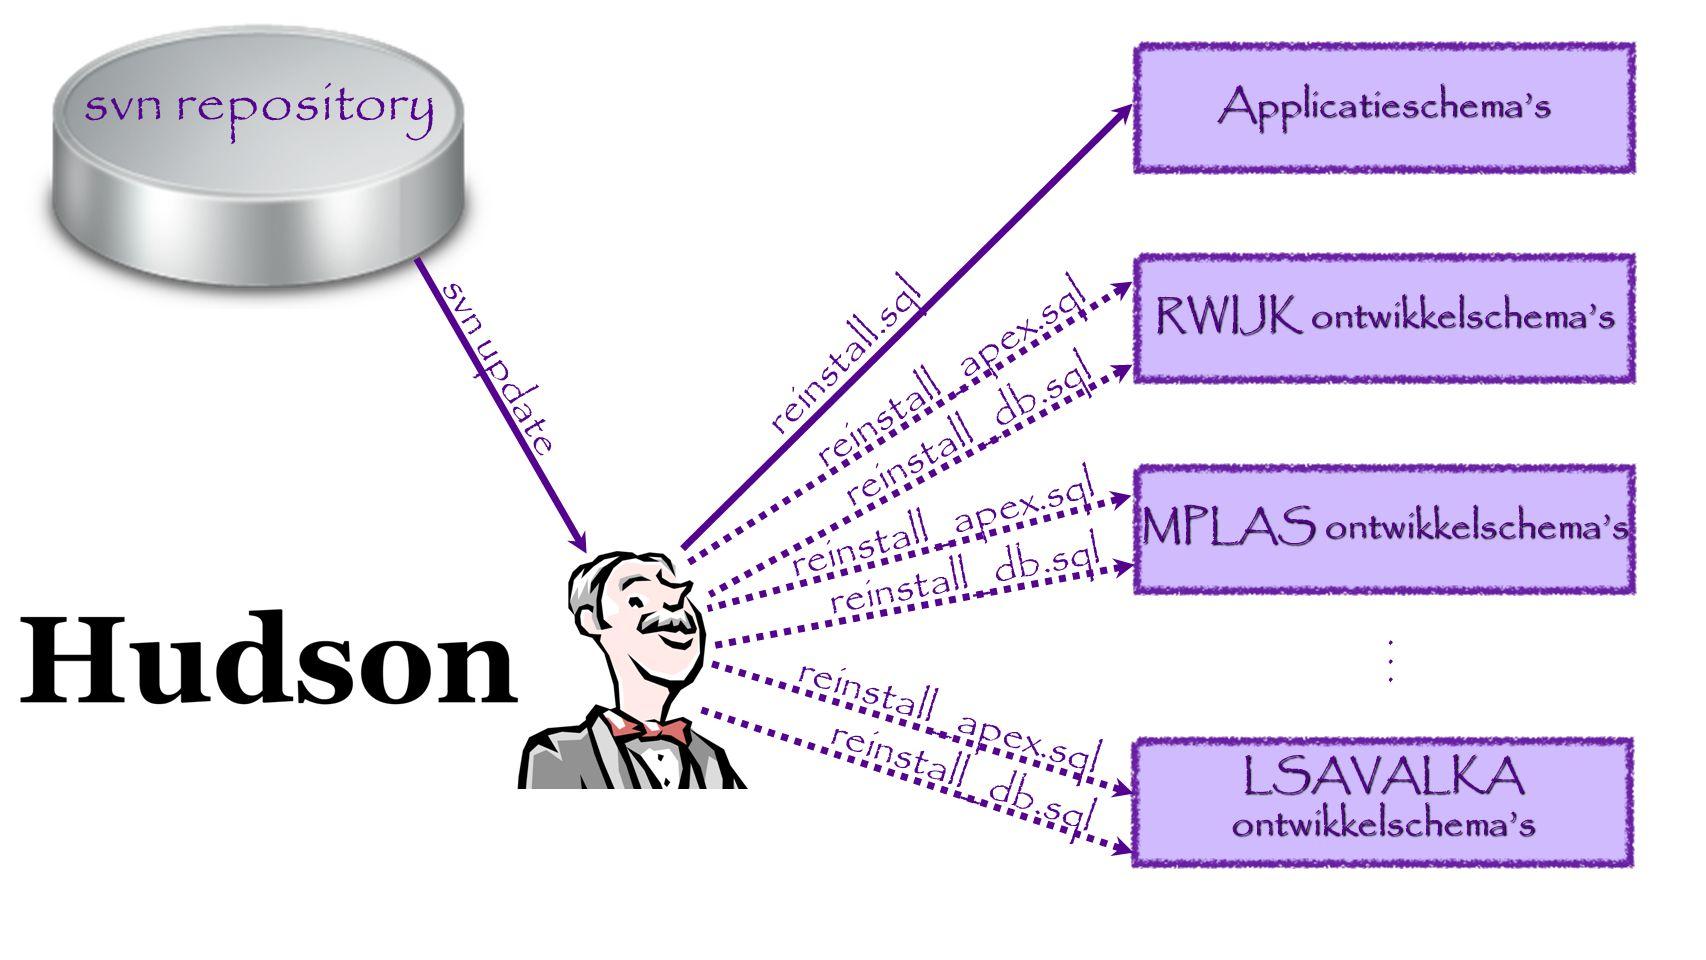 svn repository svn update reinstall.sql Applicatieschema's RWIJK ontwikkelschema's MPLAS ontwikkelschema's LSAVALKA ontwikkelschema's...